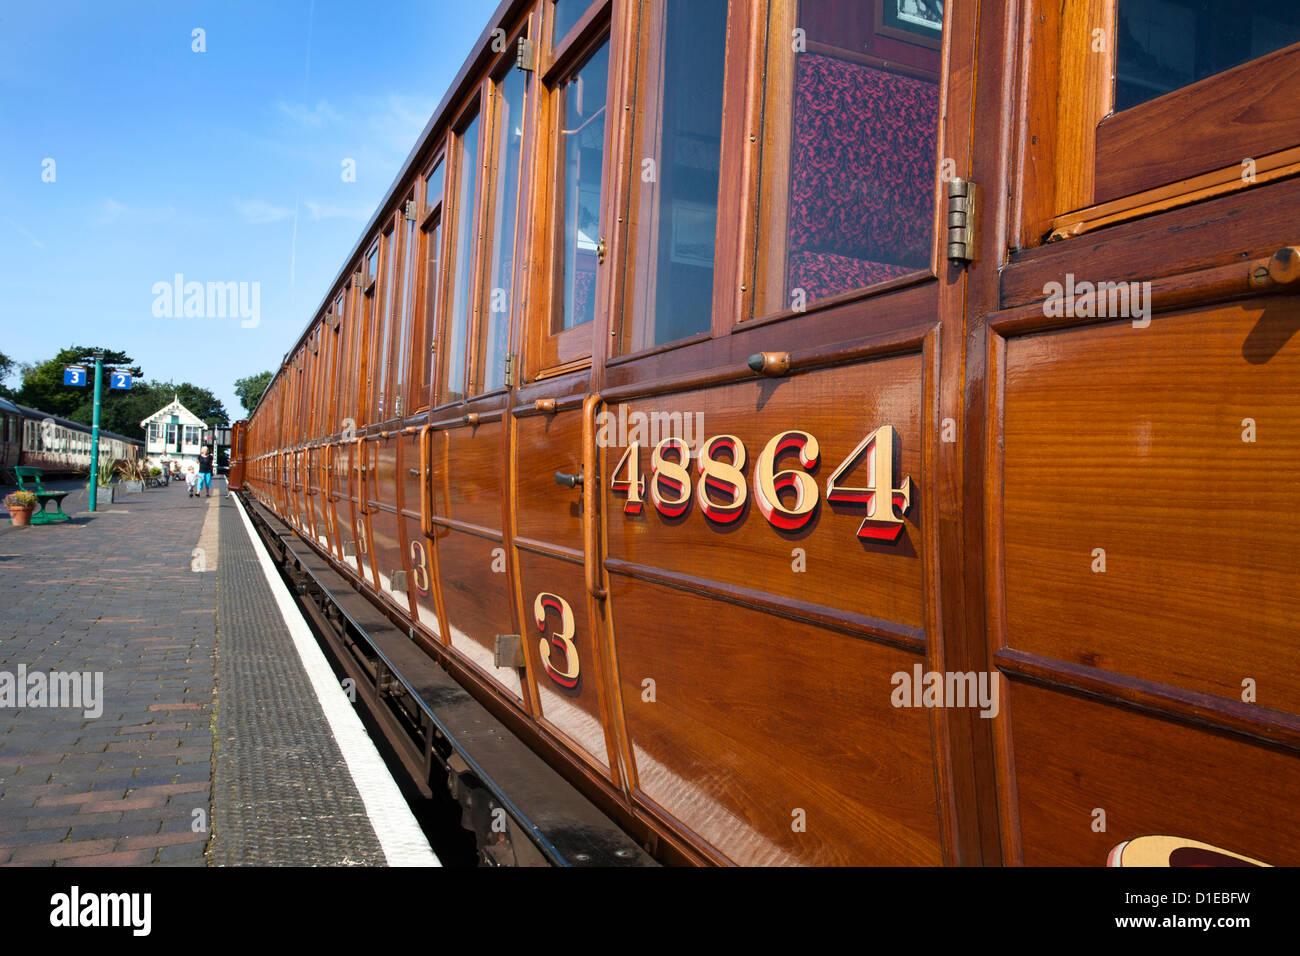 Vintage LNER du matériel roulant sur la ligne de pavot, North Norfolk, Fer à Sheringham, Norfolk, Angleterre, Photo Stock